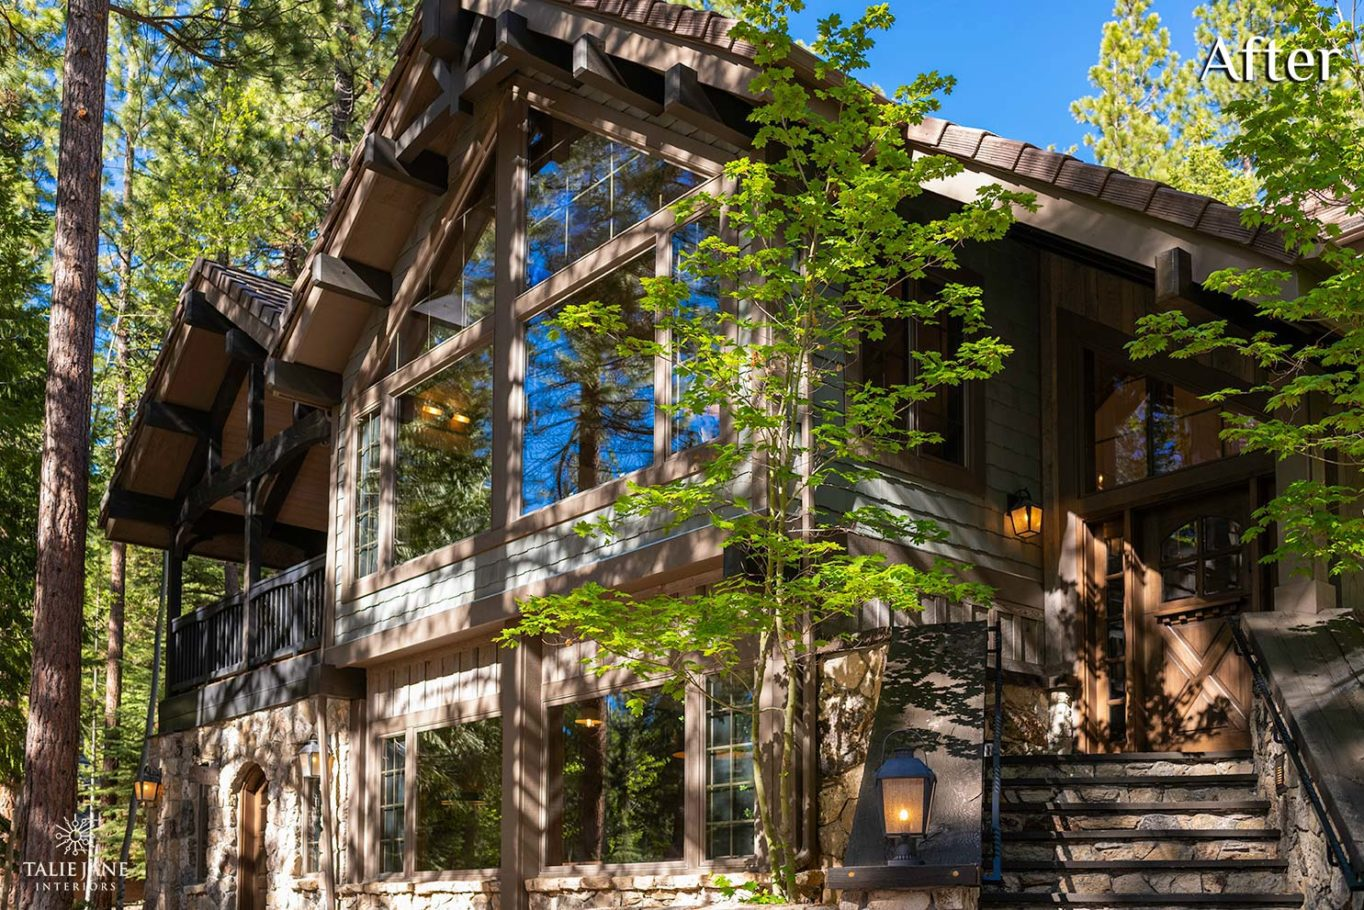 Home exterior design - Talie Jane Interiors